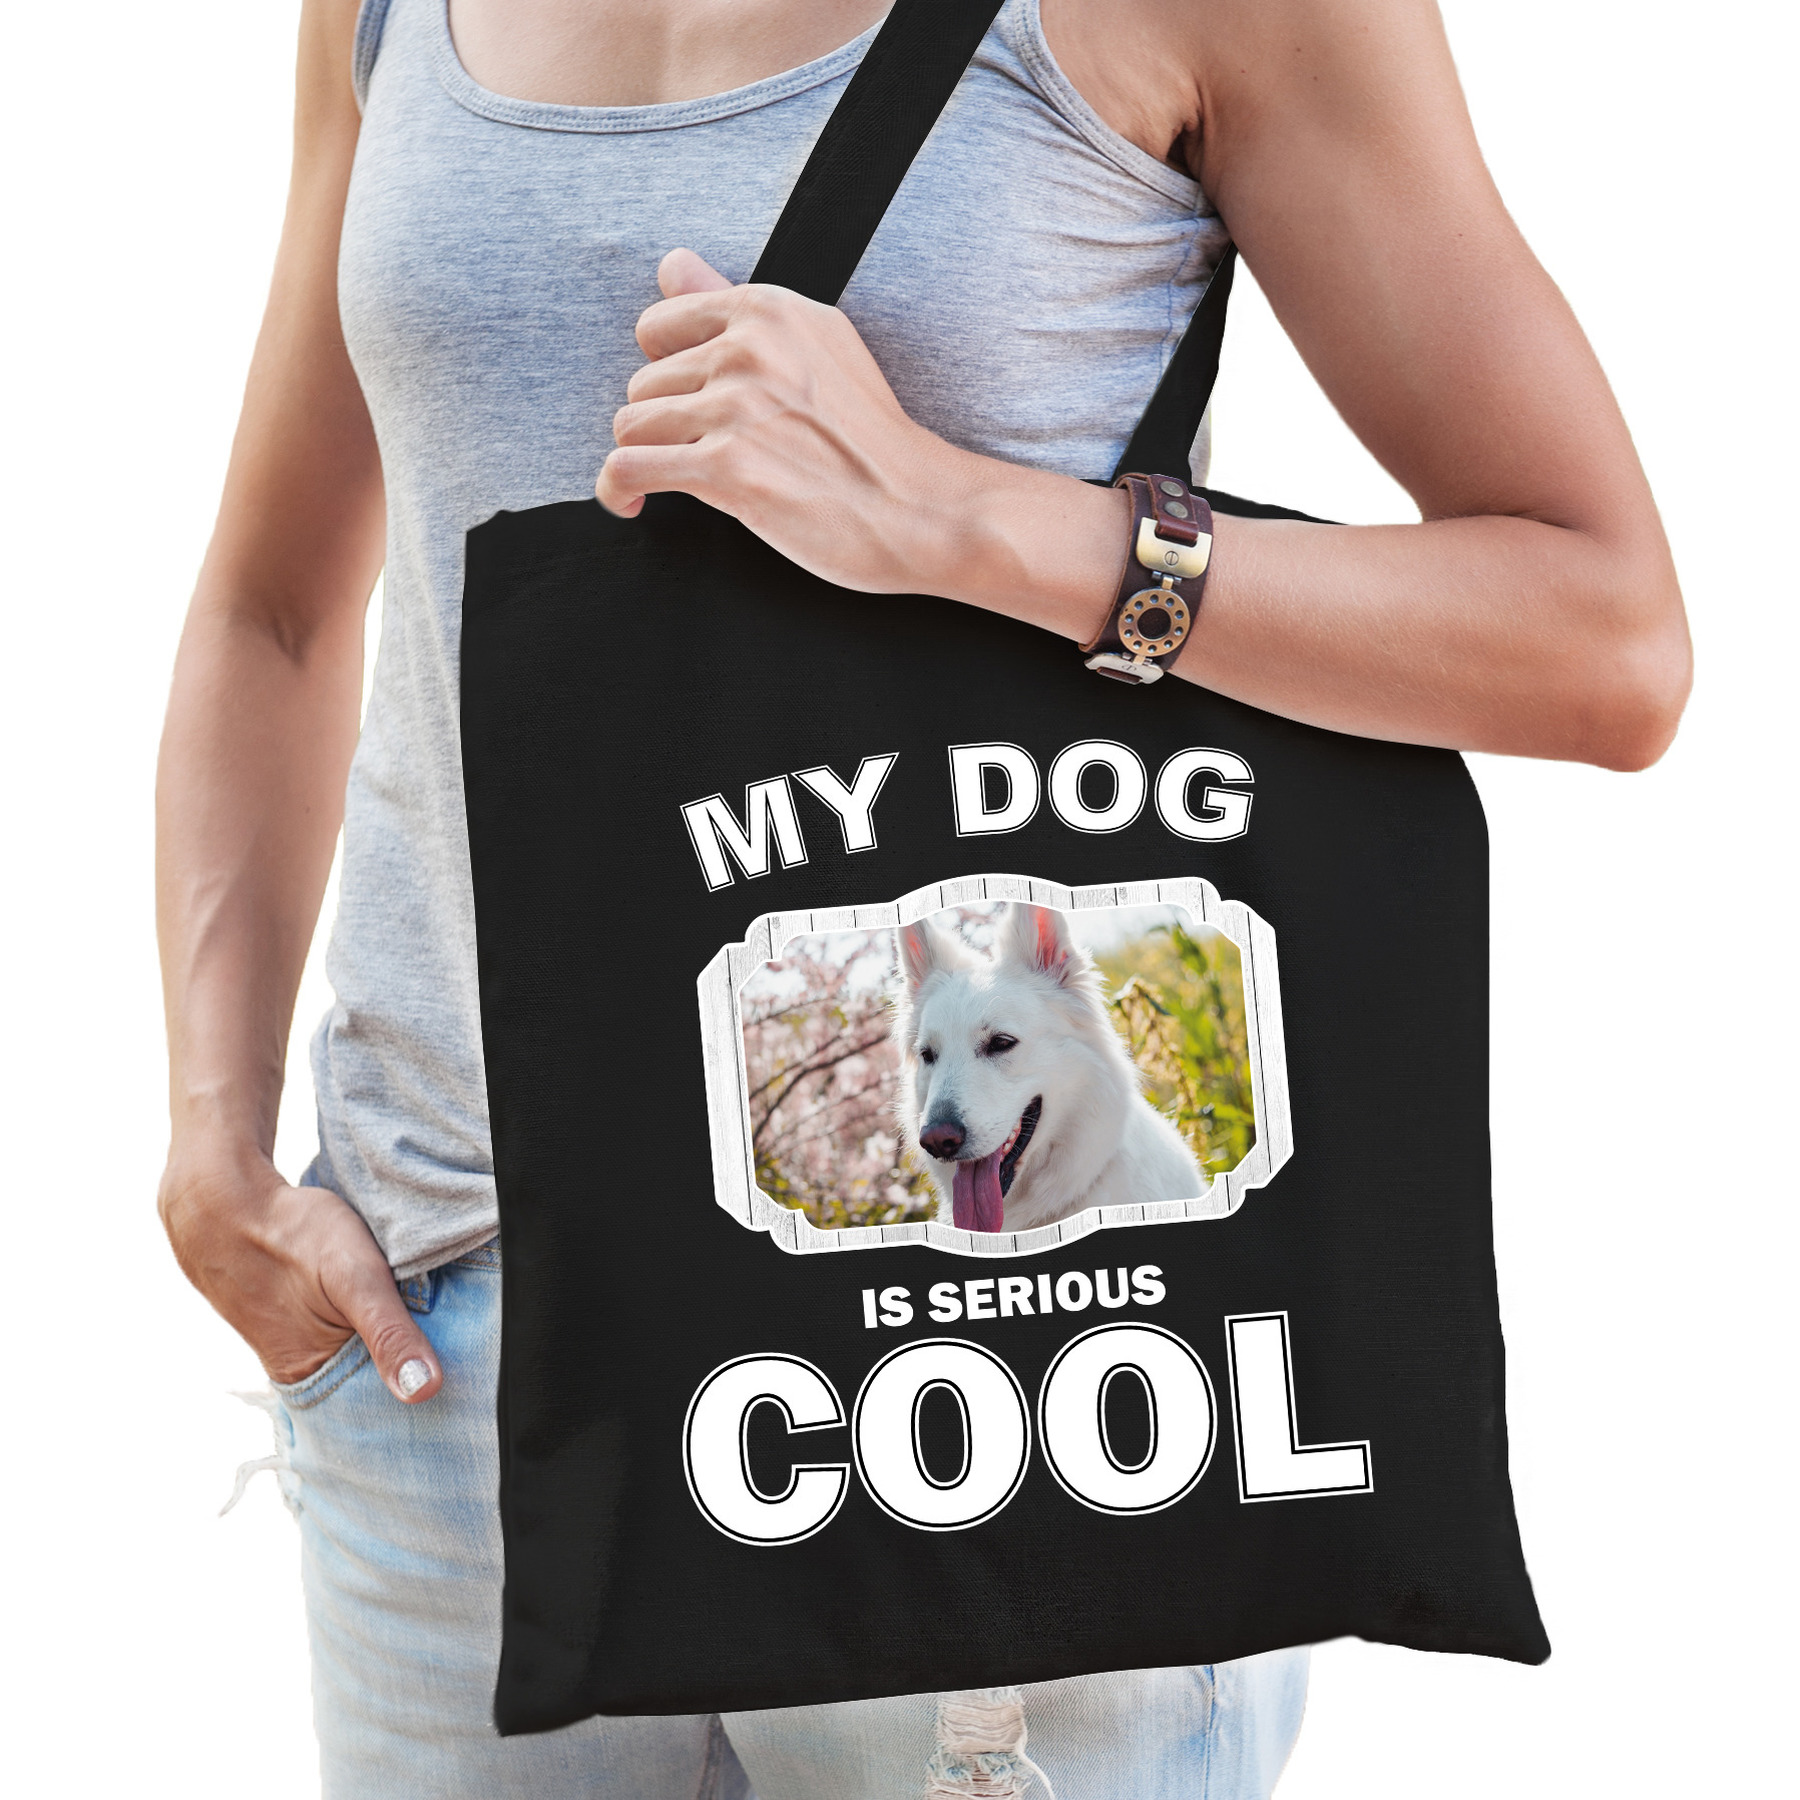 Katoenen tasje my dog is serious cool zwart - Witte herder honden cadeau tas